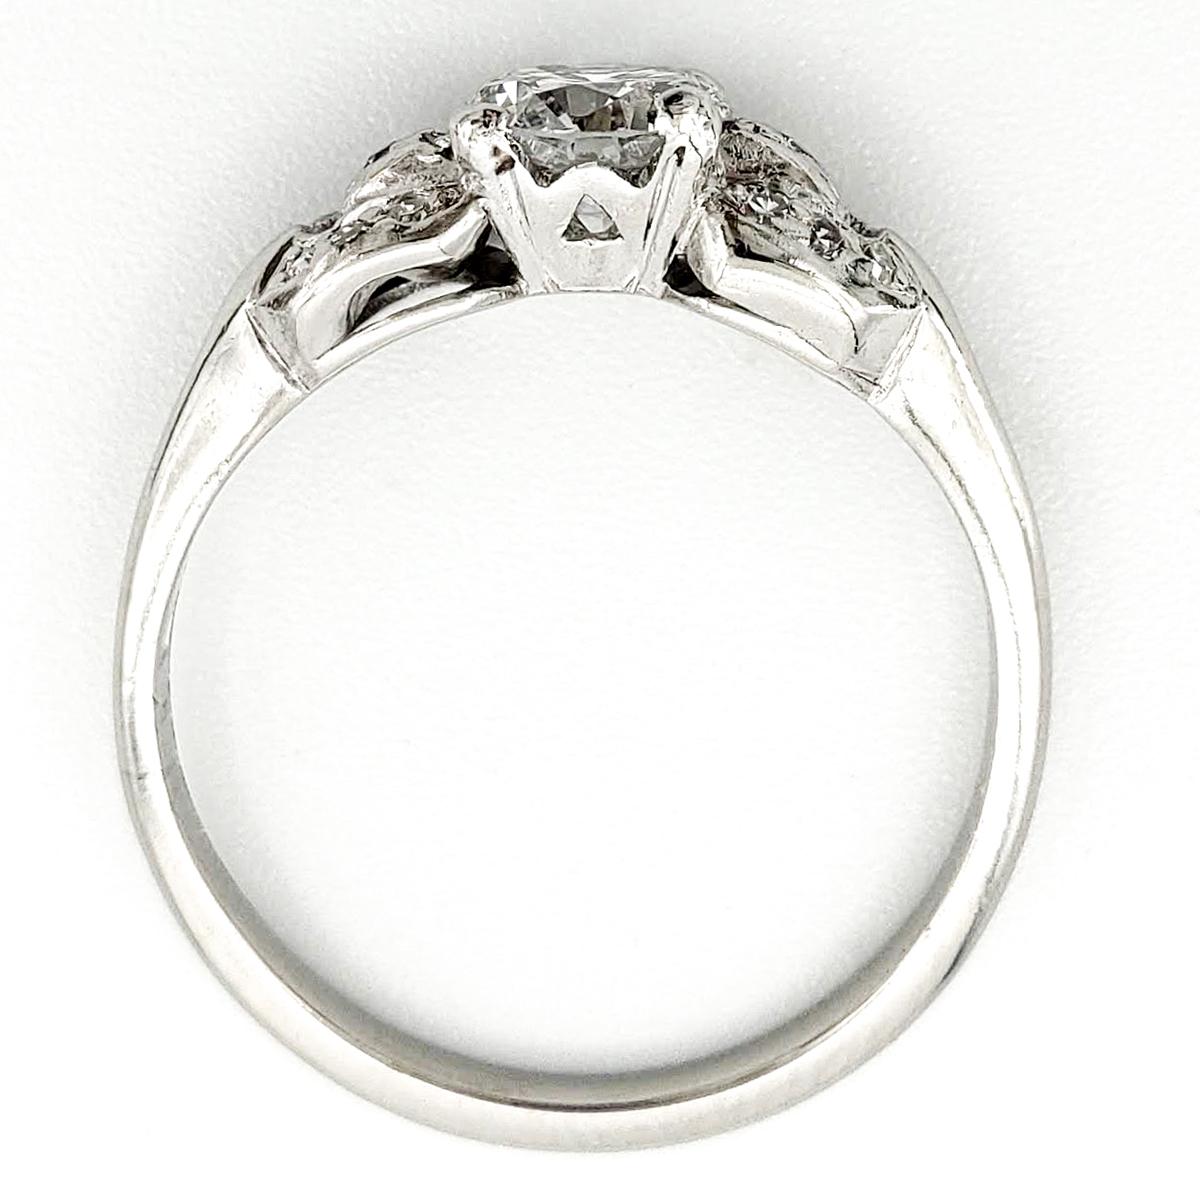 Vintage Platinum Engagement Ring With 0.59 Carat Round Brilliant Cut Diamond GIA – D VS1